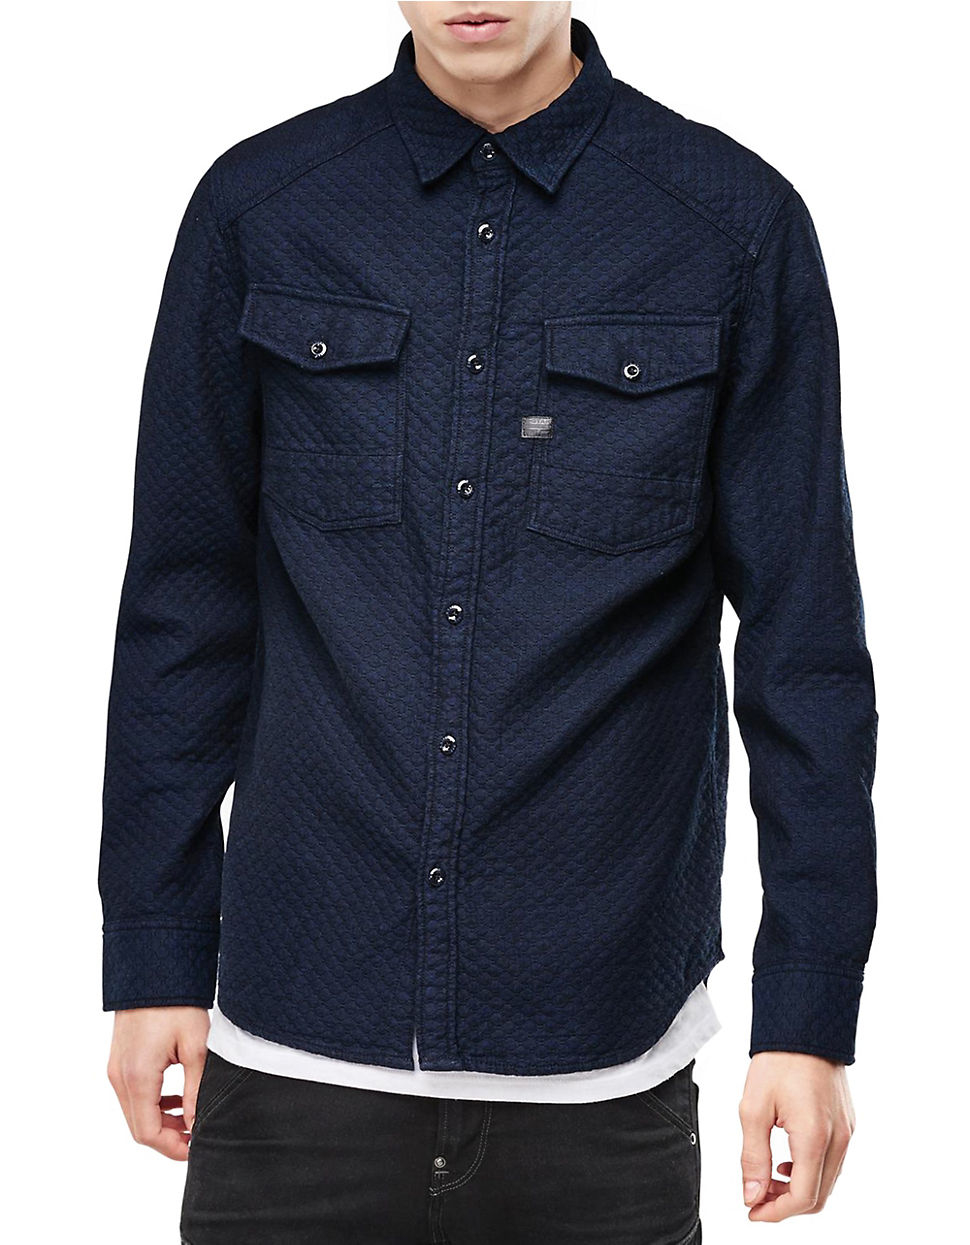 G star raw textured cotton workshirt in blue for men lyst for Blue cotton work shirts